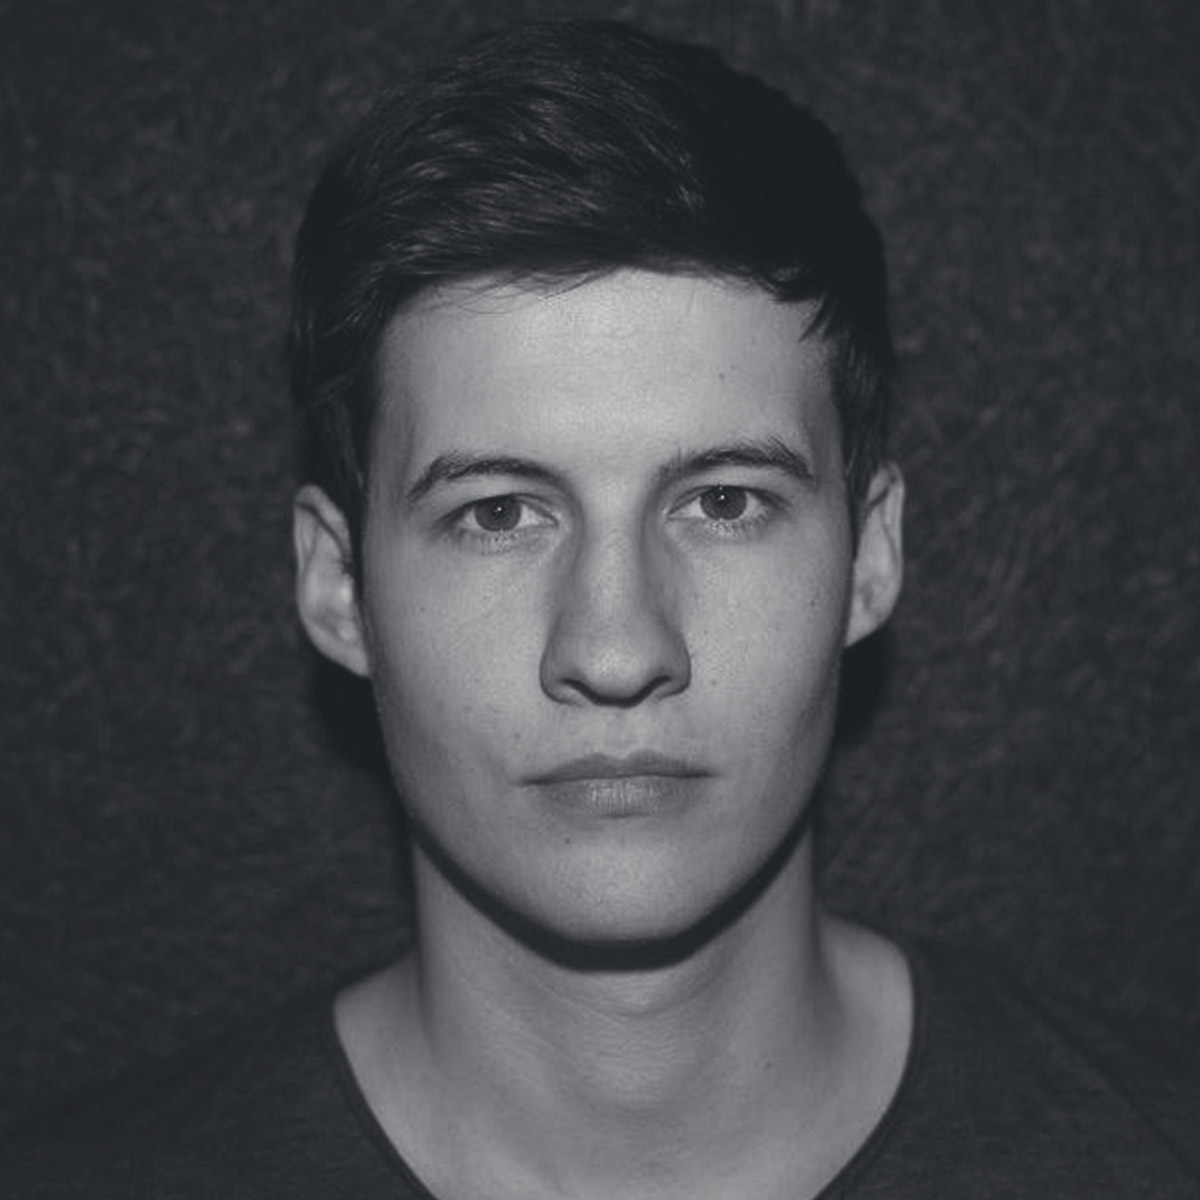 Markus Hatvan